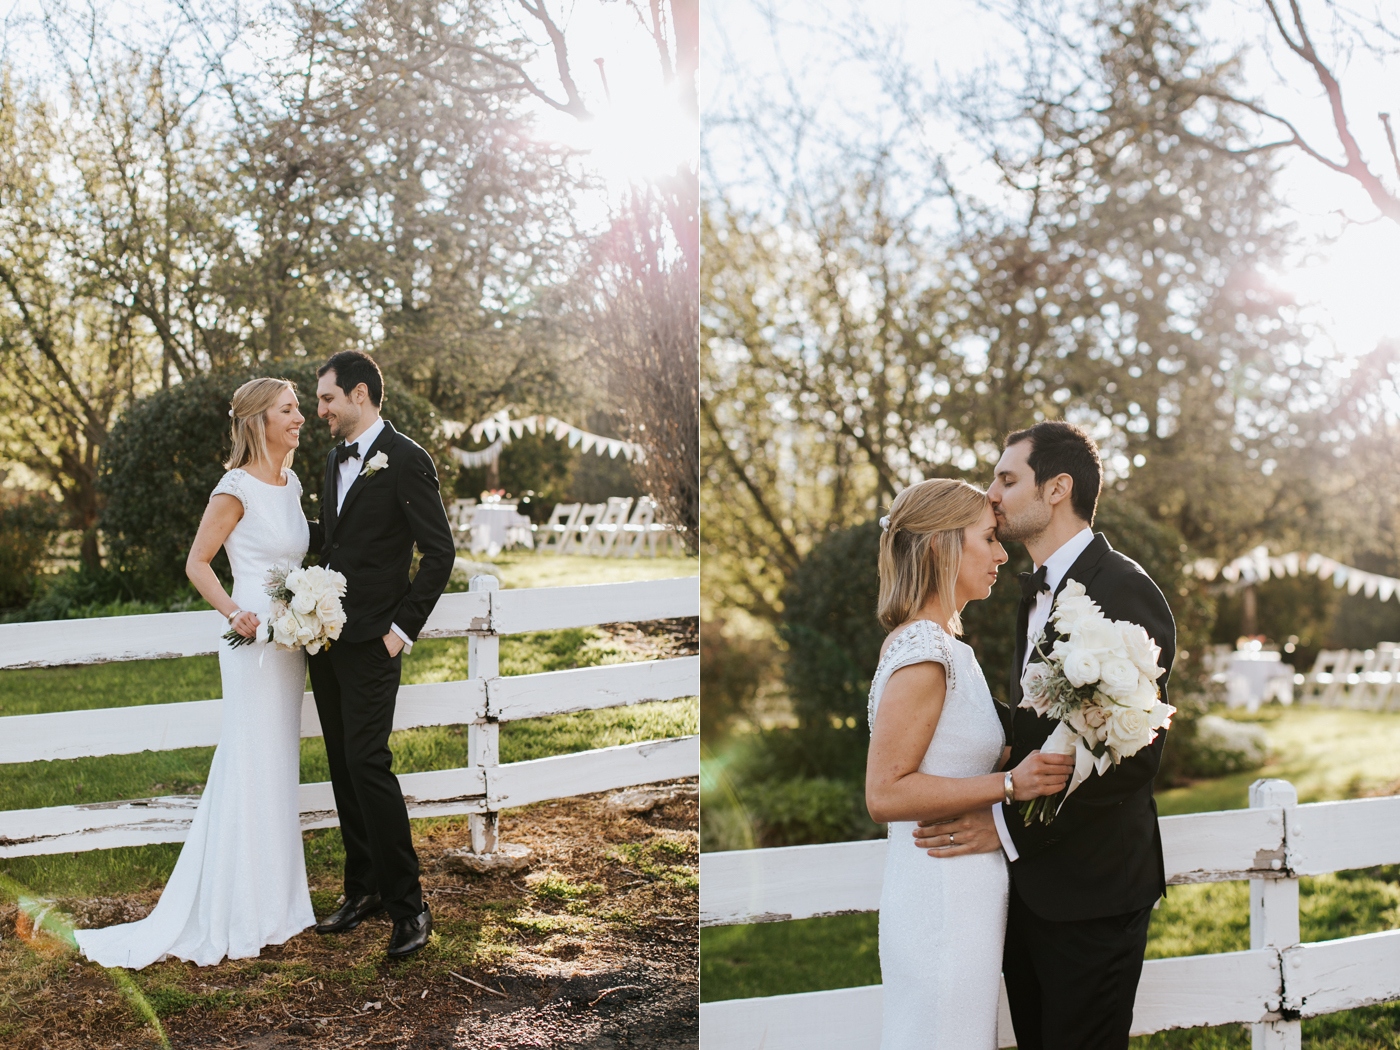 Bridget & James - Orange Country Wedding - Samantha Heather Photography-123.jpg